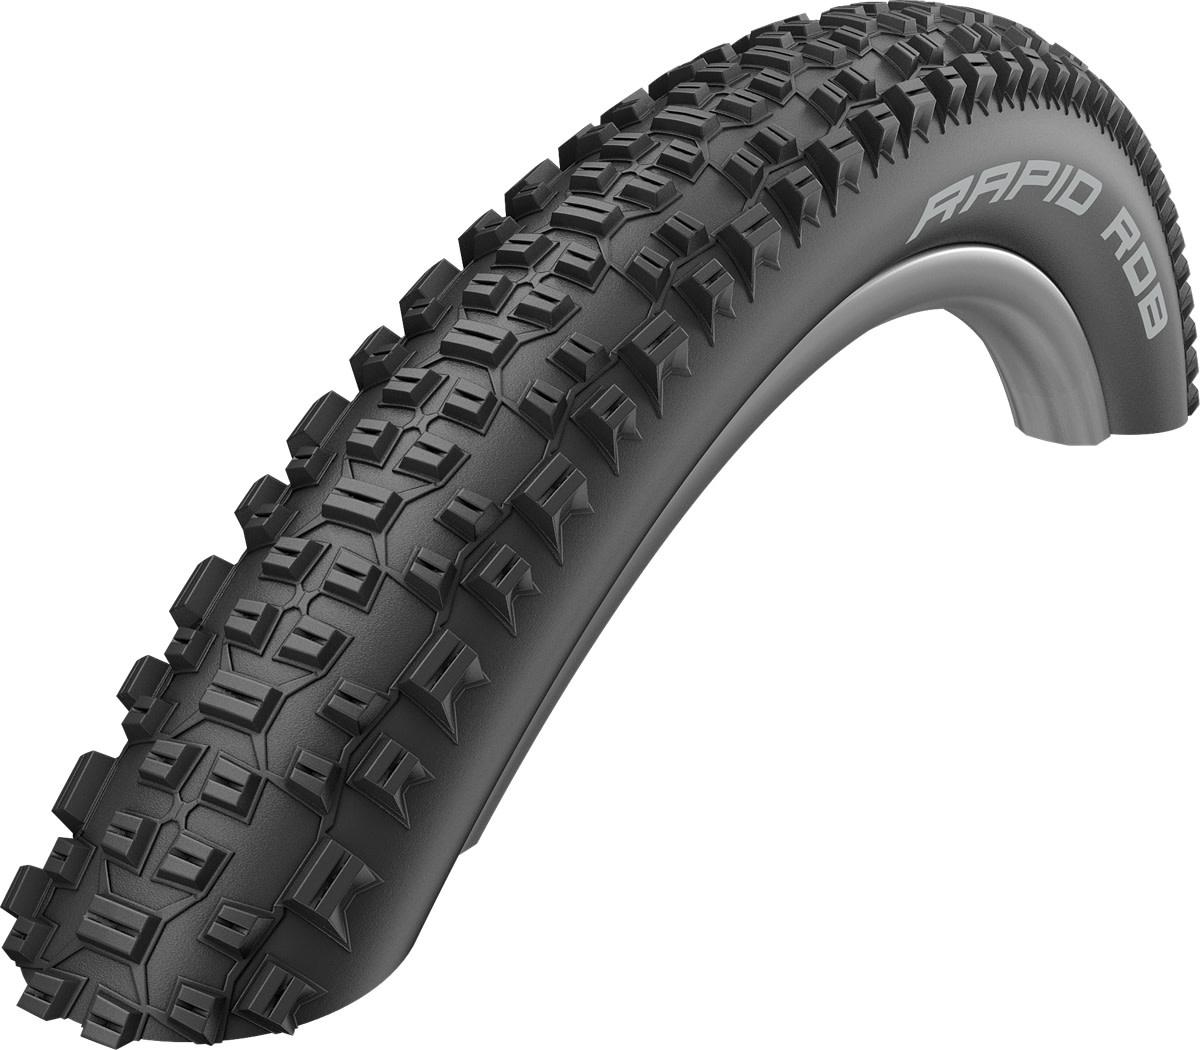 Schwalbe Rapid Rob Active Line All Terrain Tyre in Black - 29 x 2.10